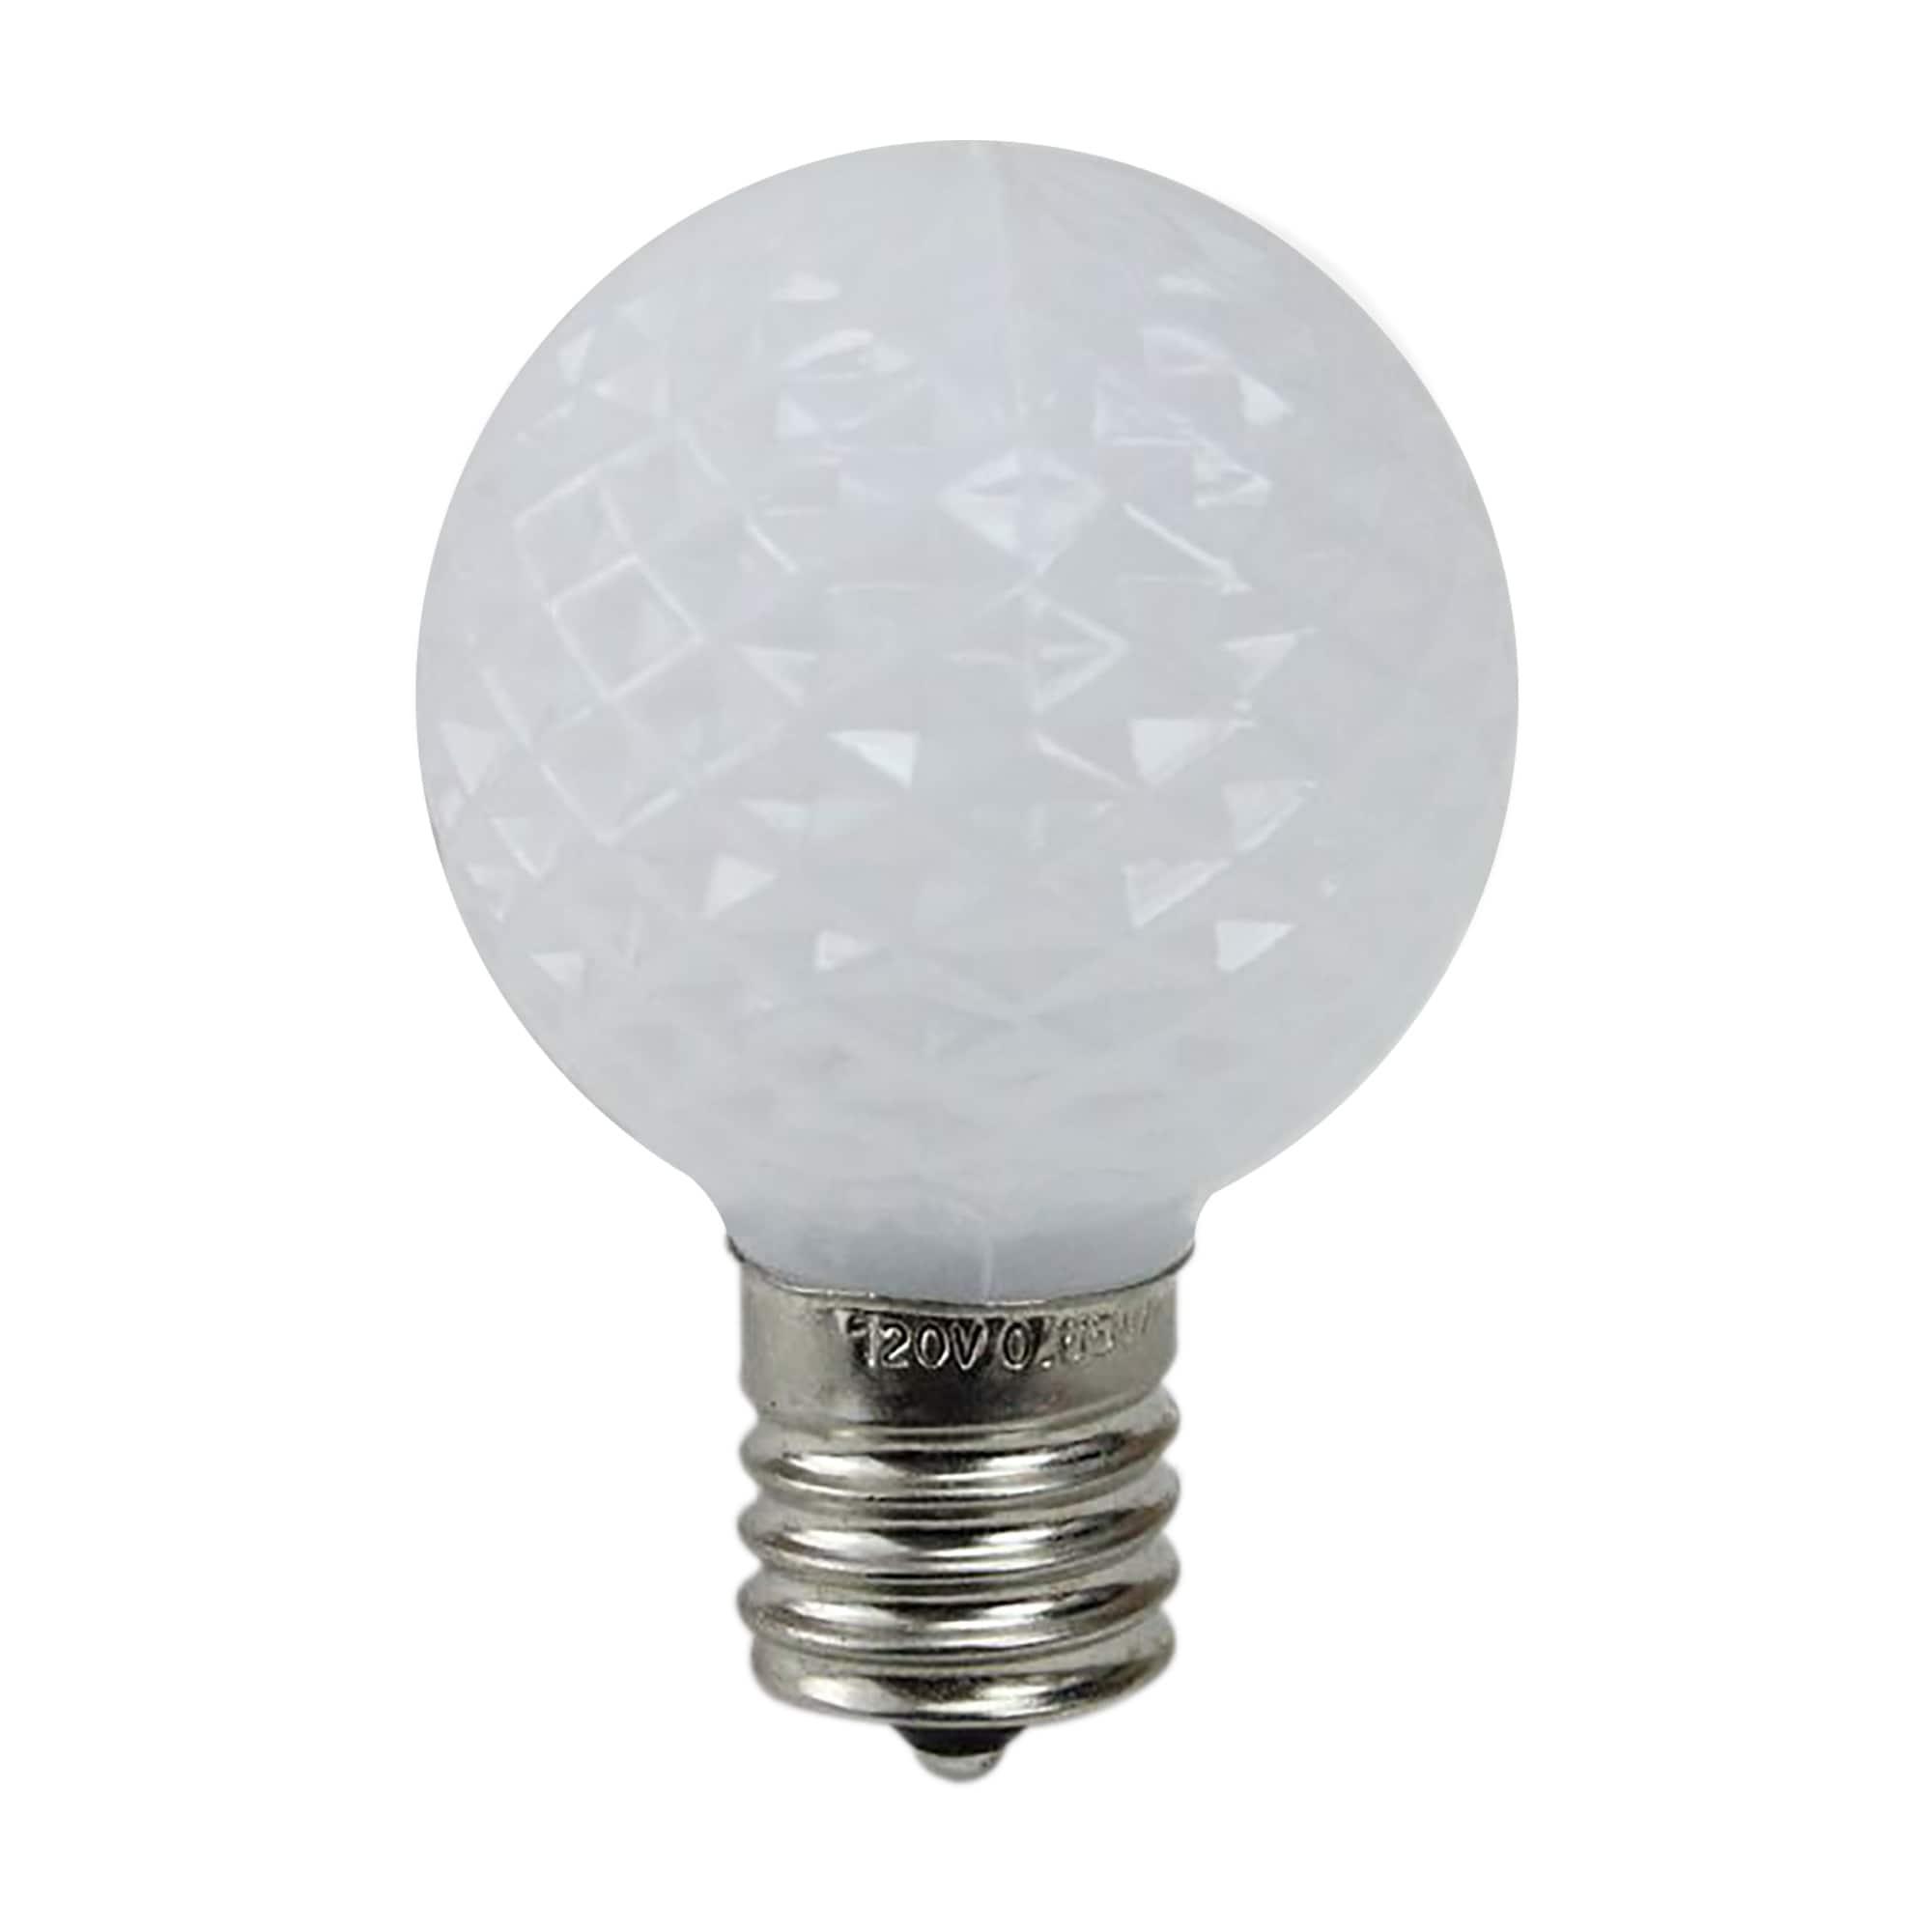 LED Amber color 25 Units X C7 LED Christmas Light Bulb Faceted